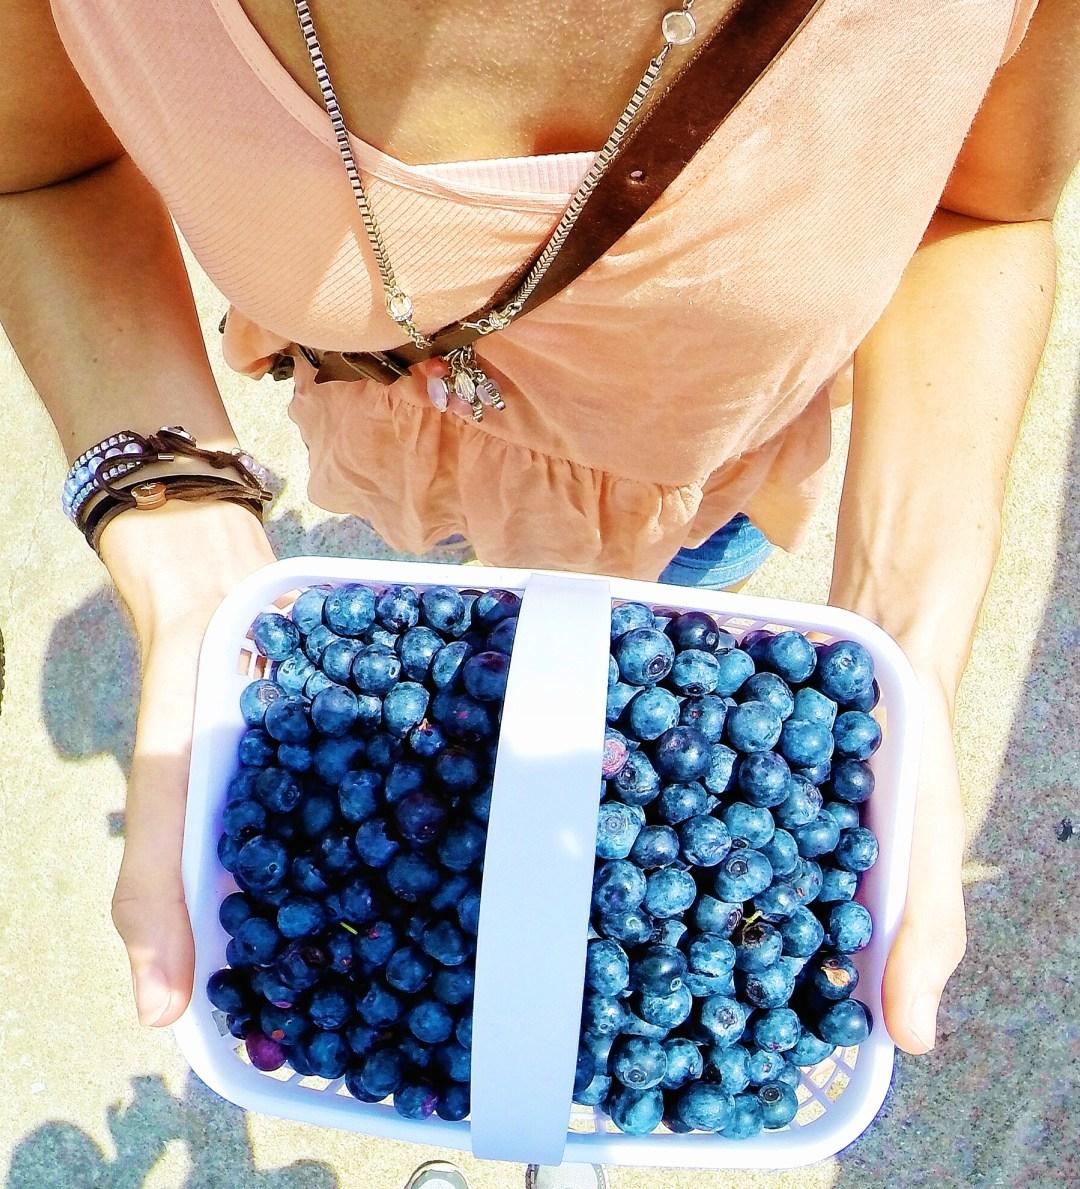 fresh blueberries local